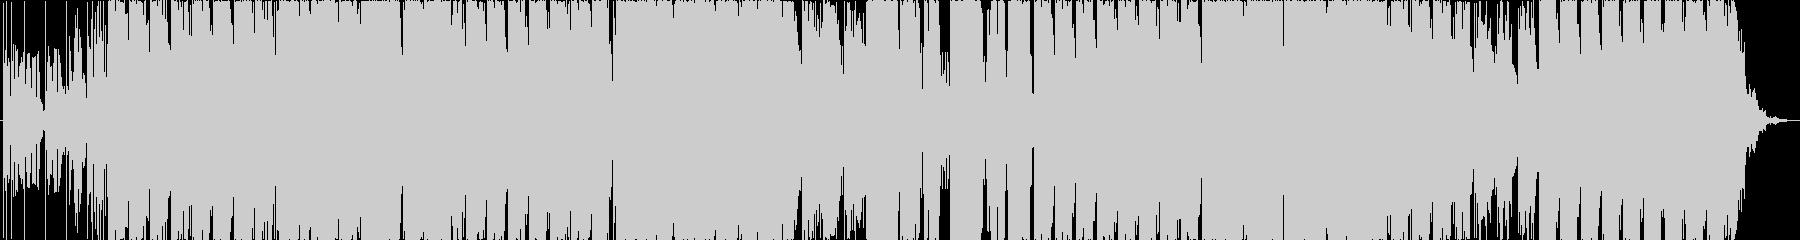 Loose tune of violin and piano's unreproduced waveform